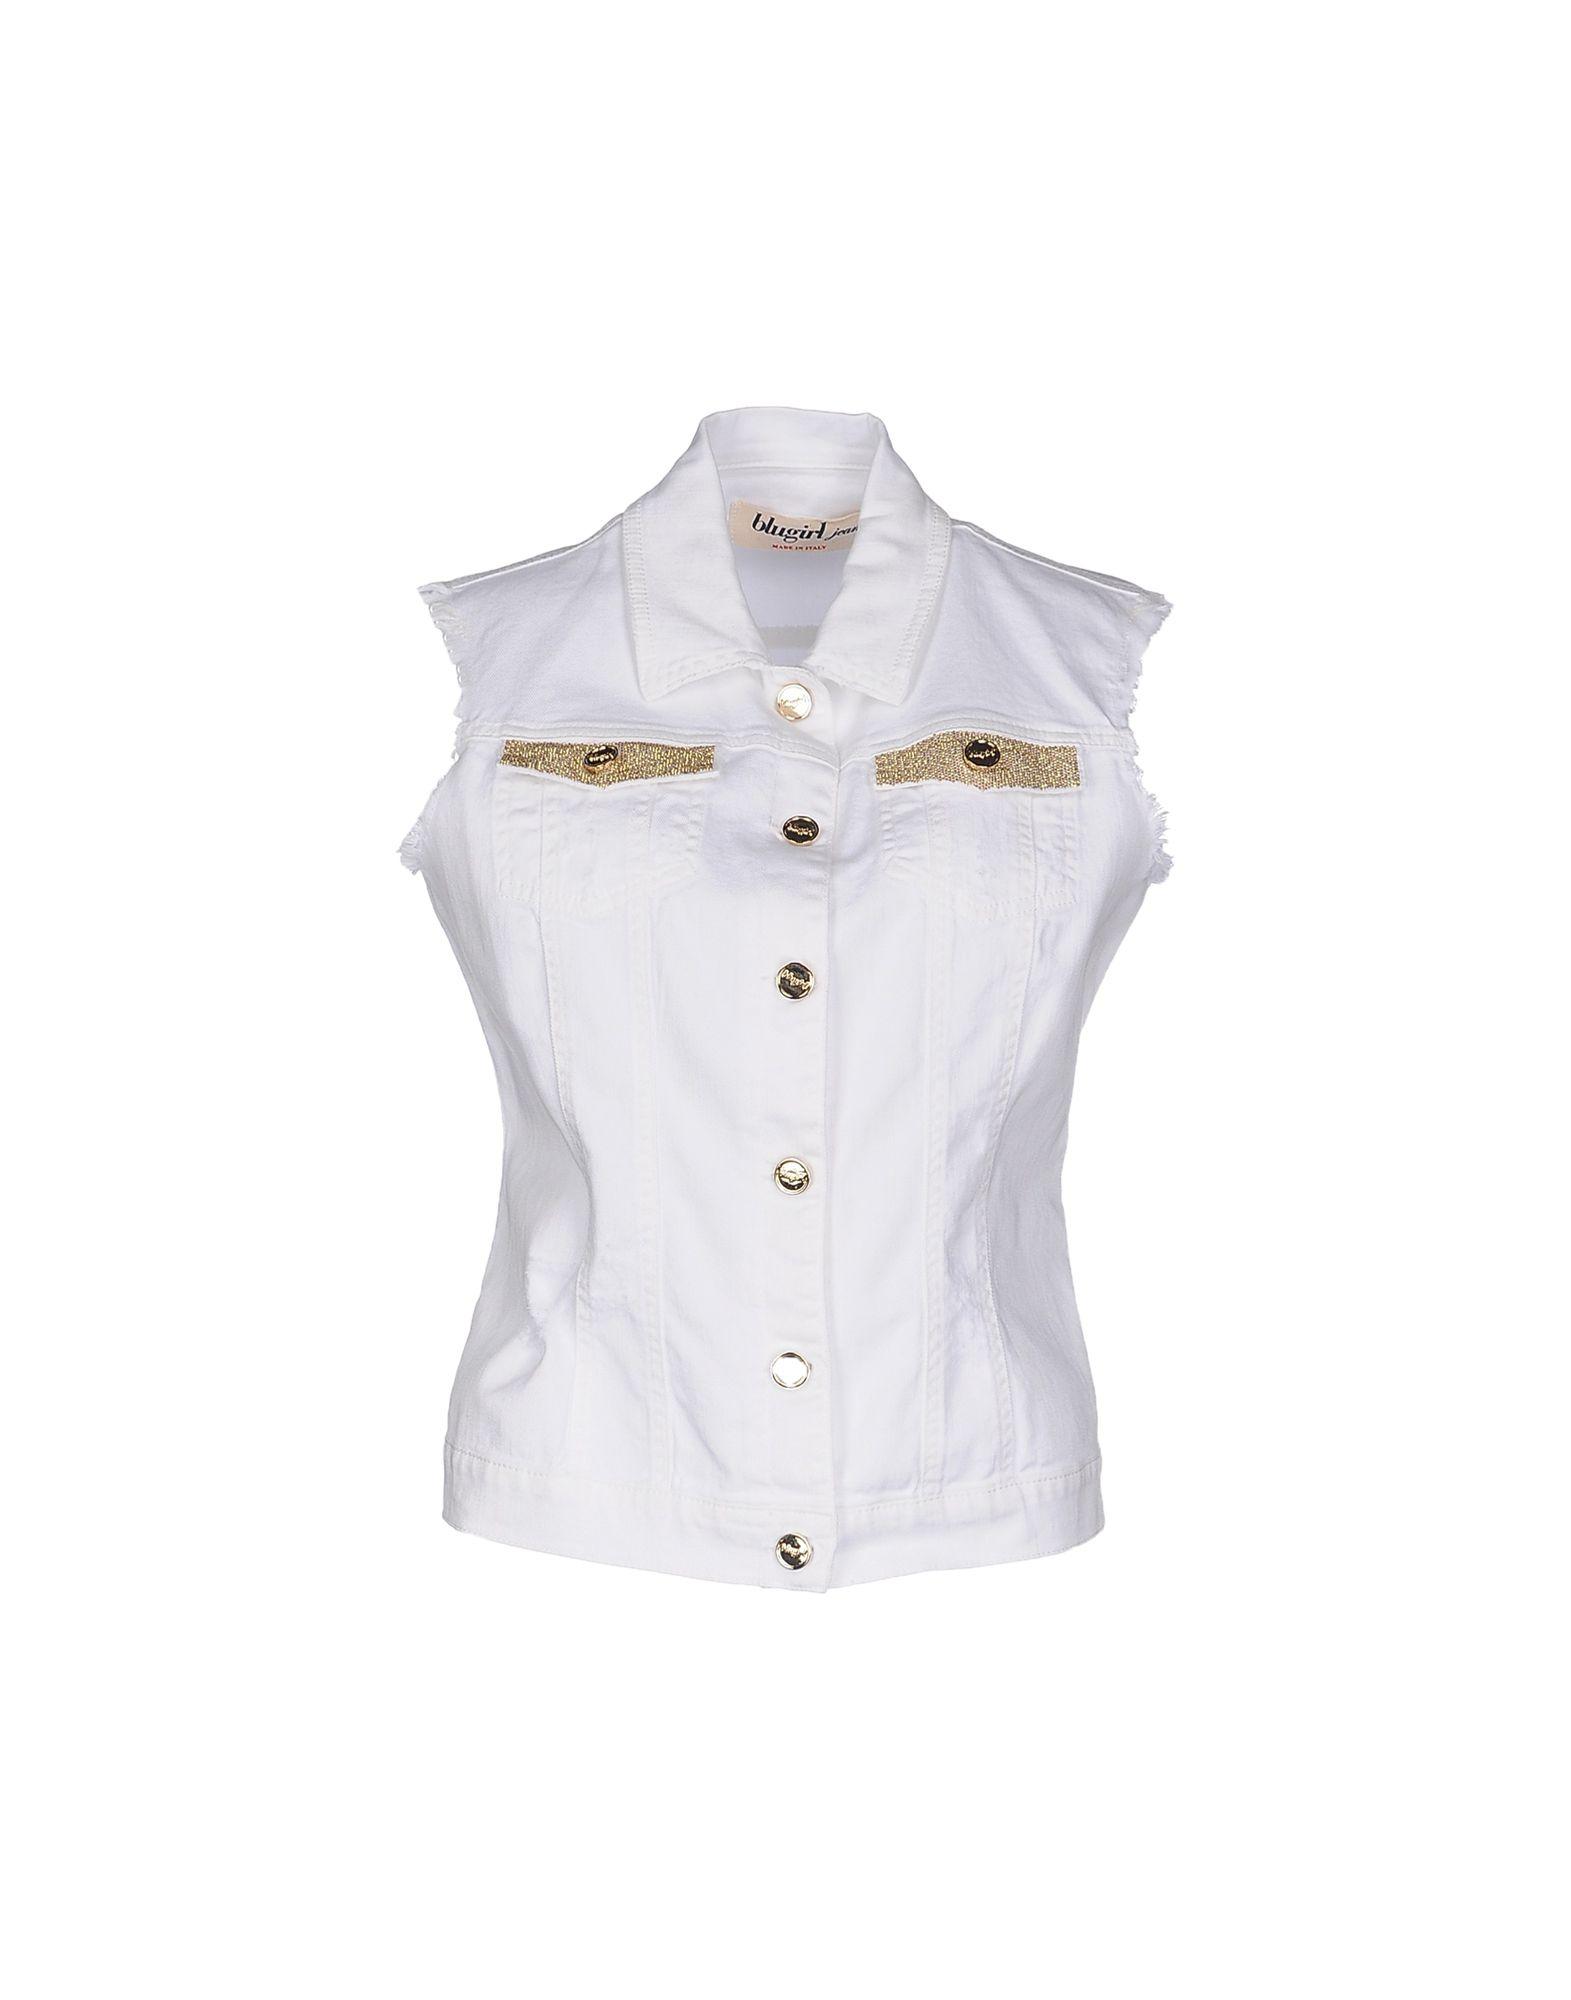 BLUGIRL JEANS Denim outerwear